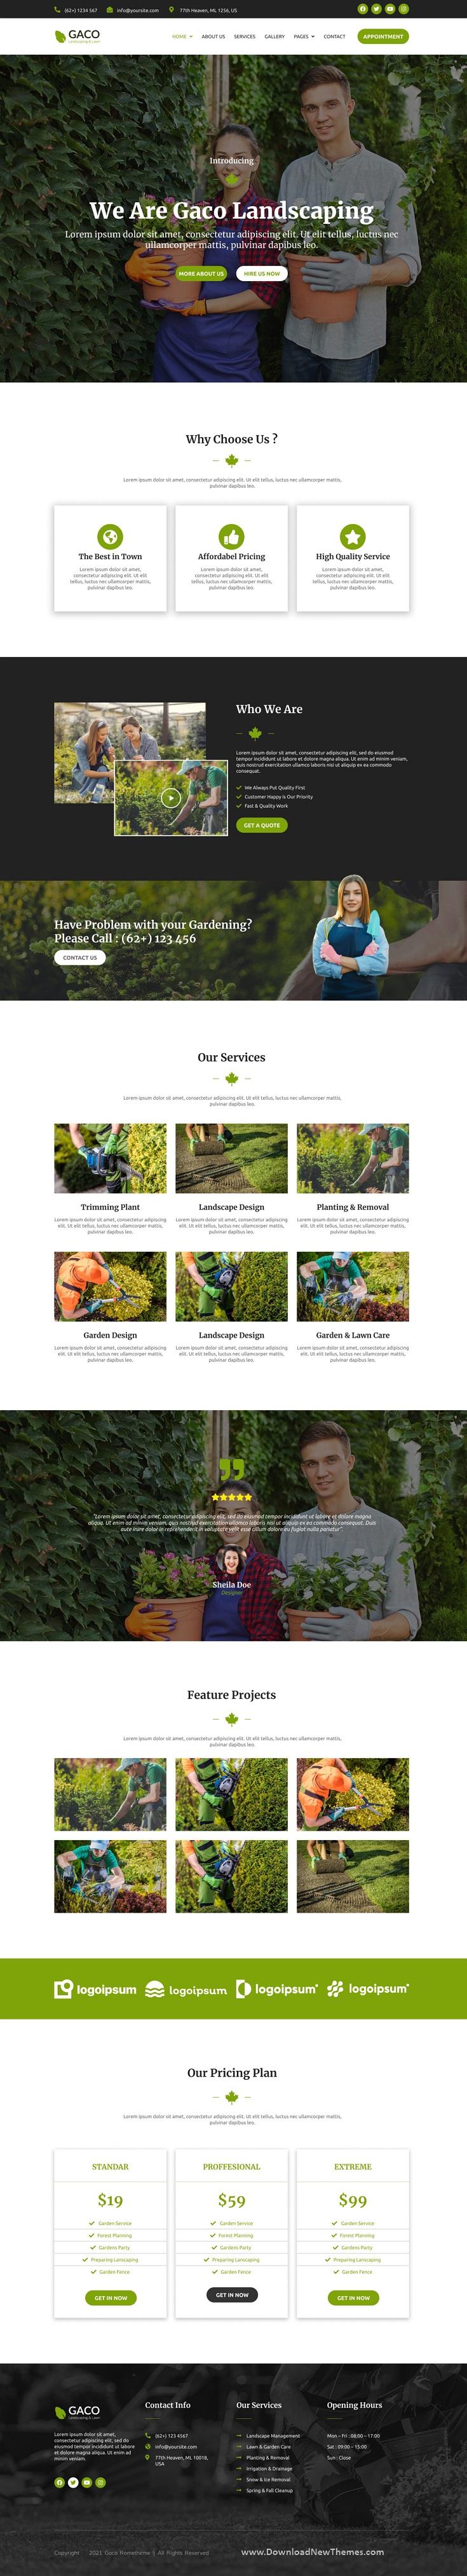 Landscape & Gardening Figma Template